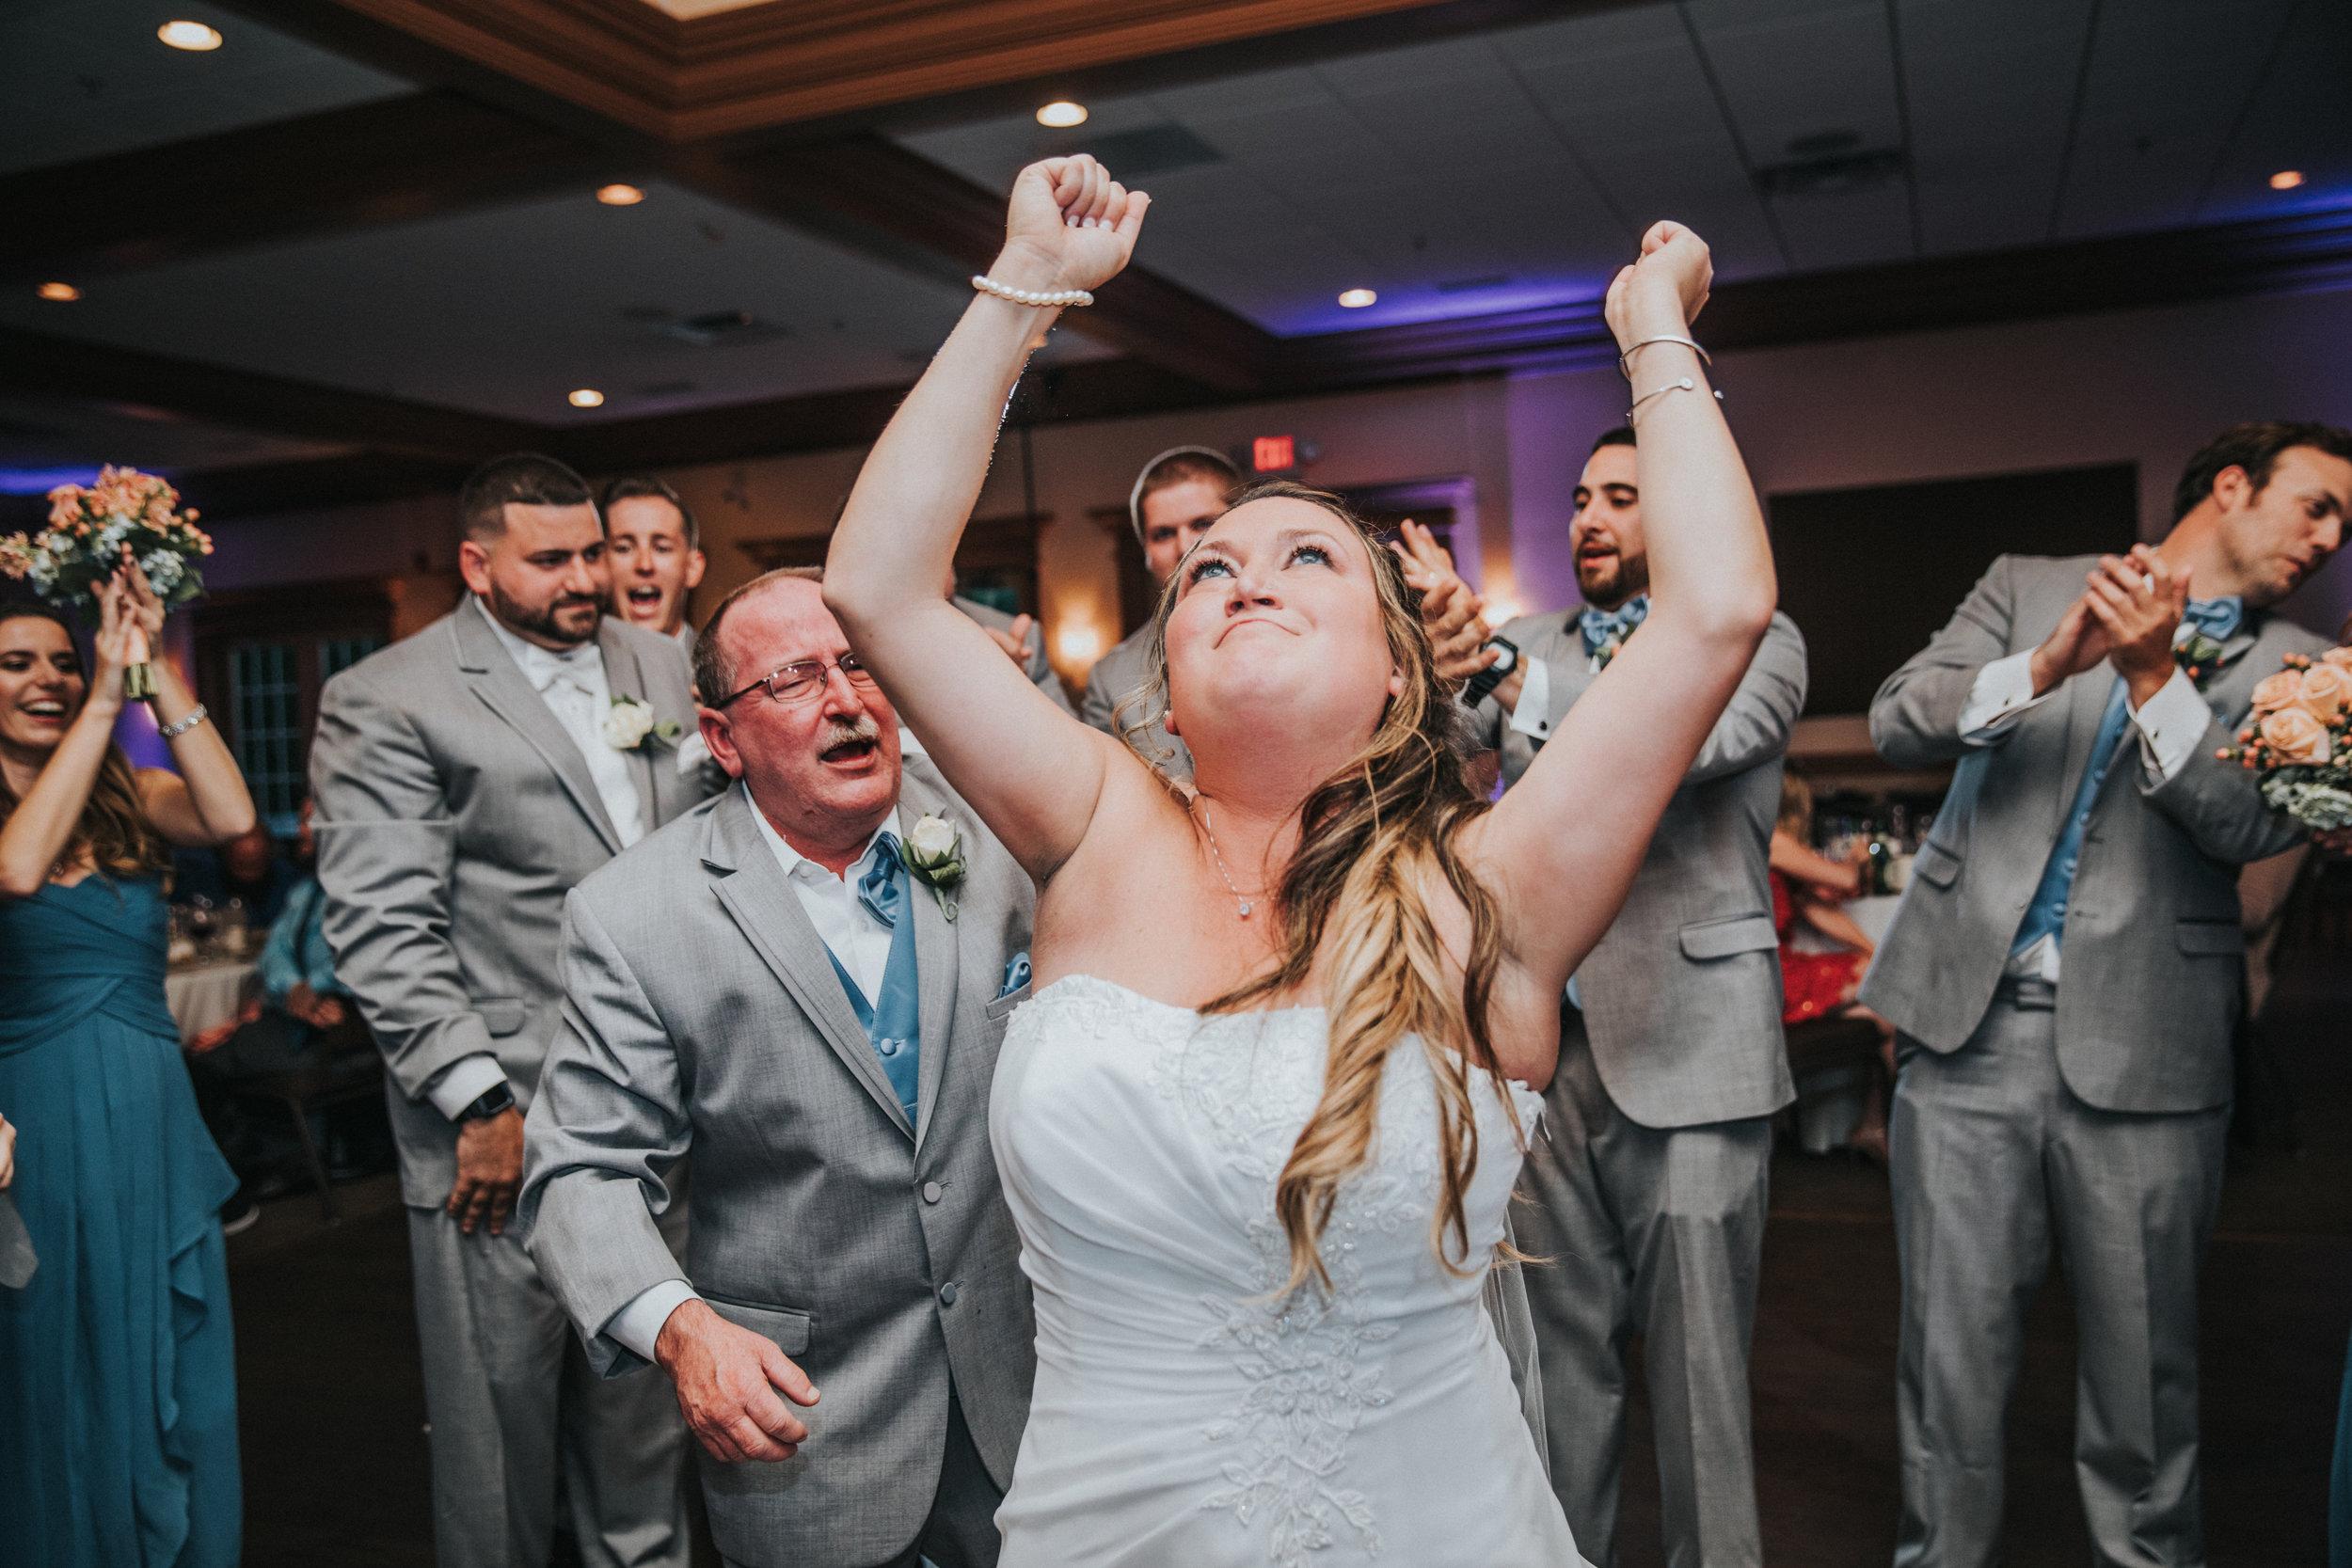 New-Jersey-Wedding-Photographer-JennaLynnPhotography-ValenzanoWinery-Reception-79.jpg